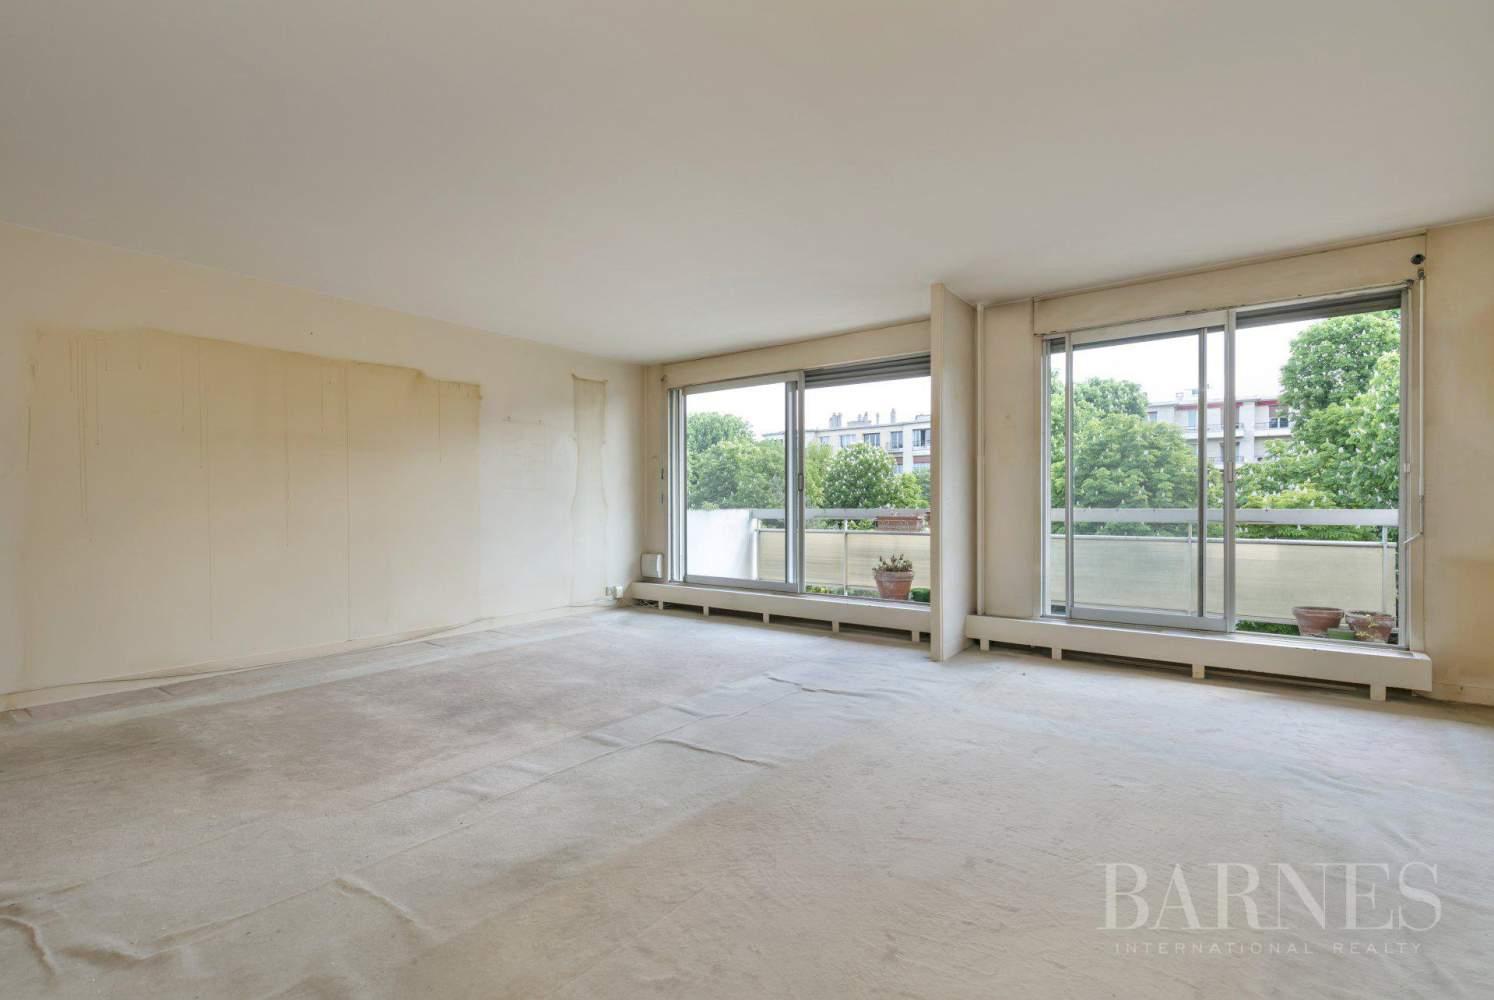 Neuilly-sur-Seine  - Appartement 3 Pièces, 1 Chambre - picture 2